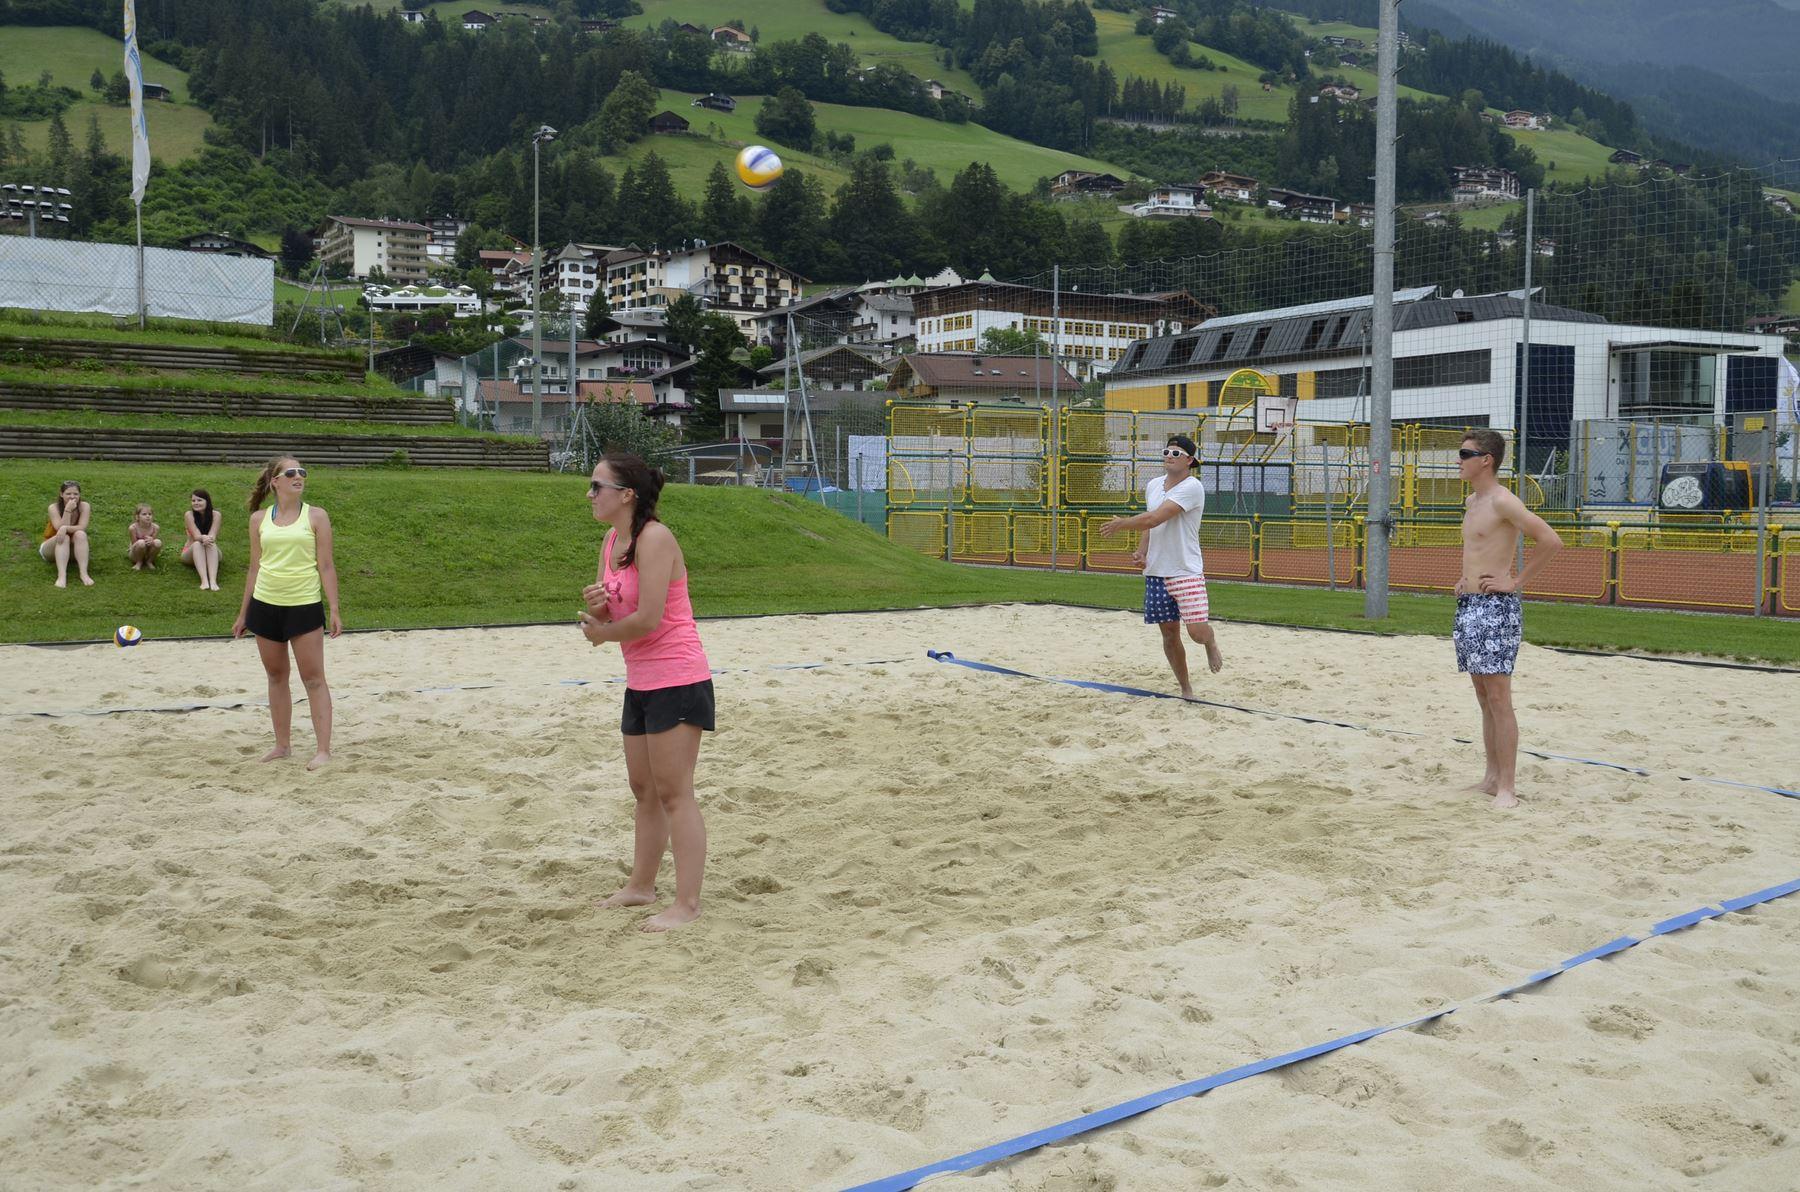 2016-07-02 Beachvolleyball 068